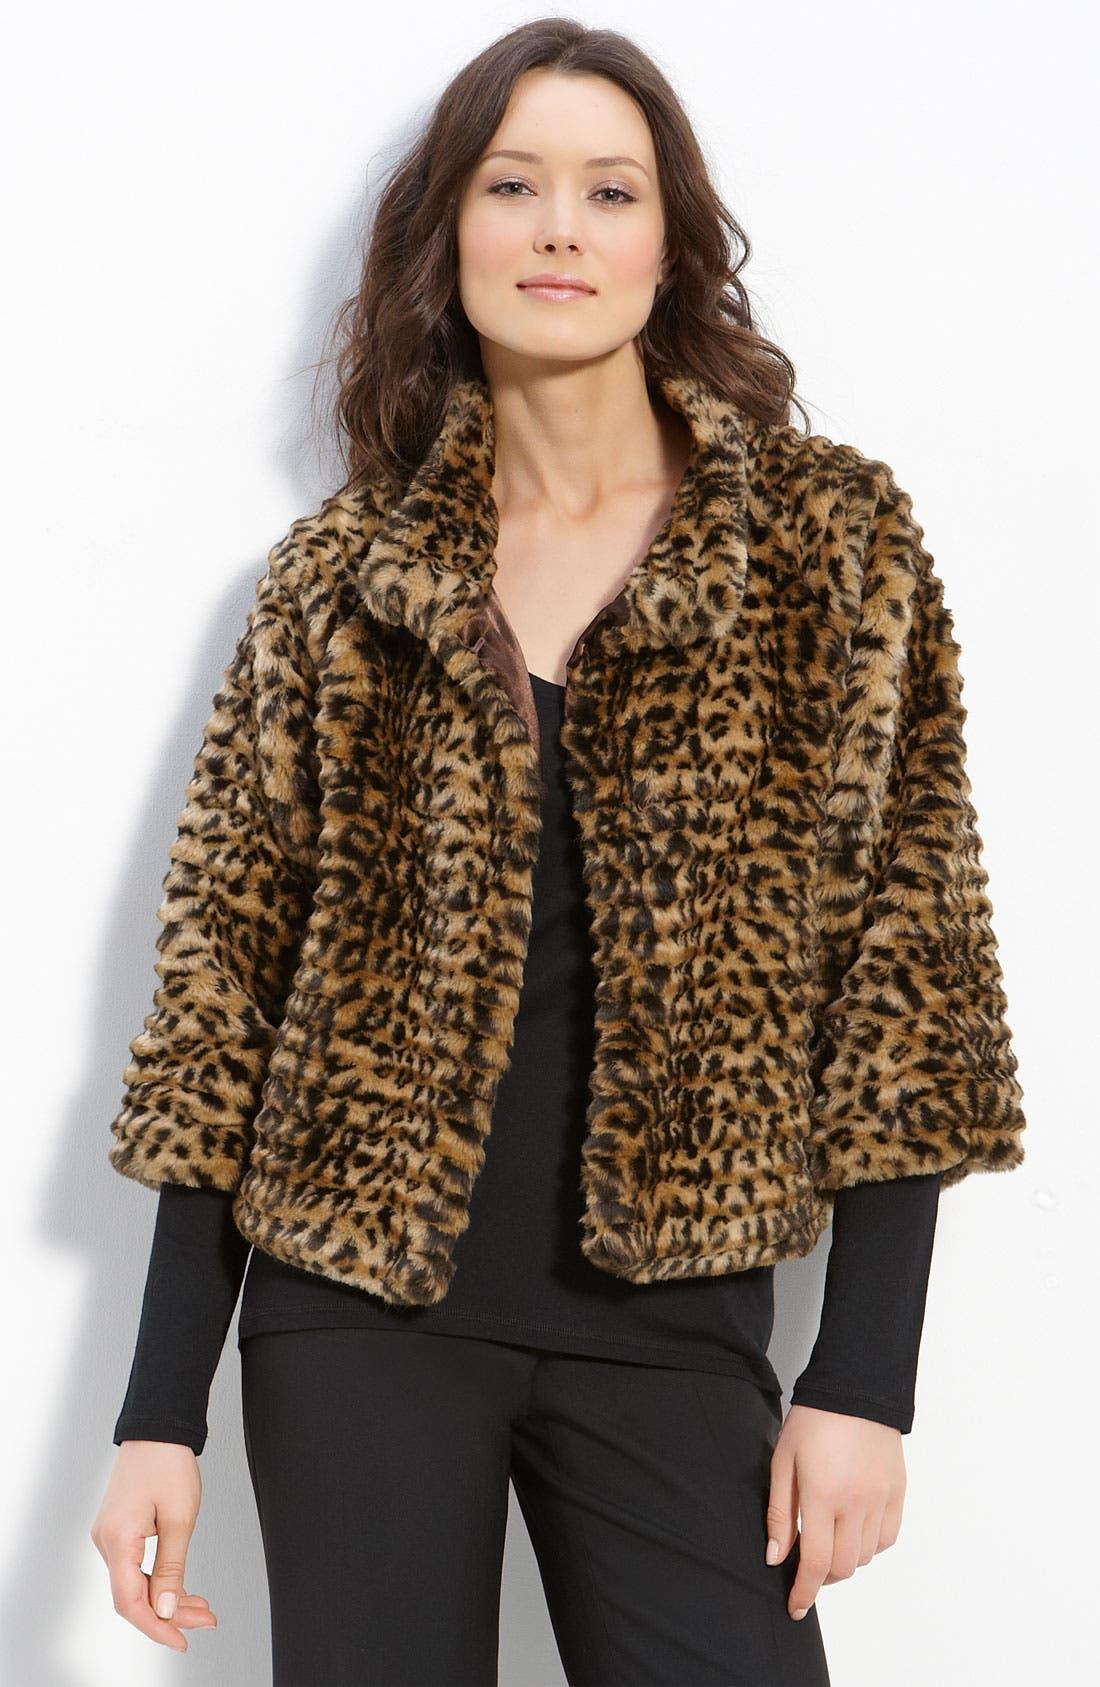 Alternate Image 1 Selected - Via Spiga 'Andrea' Faux Fur Jacket